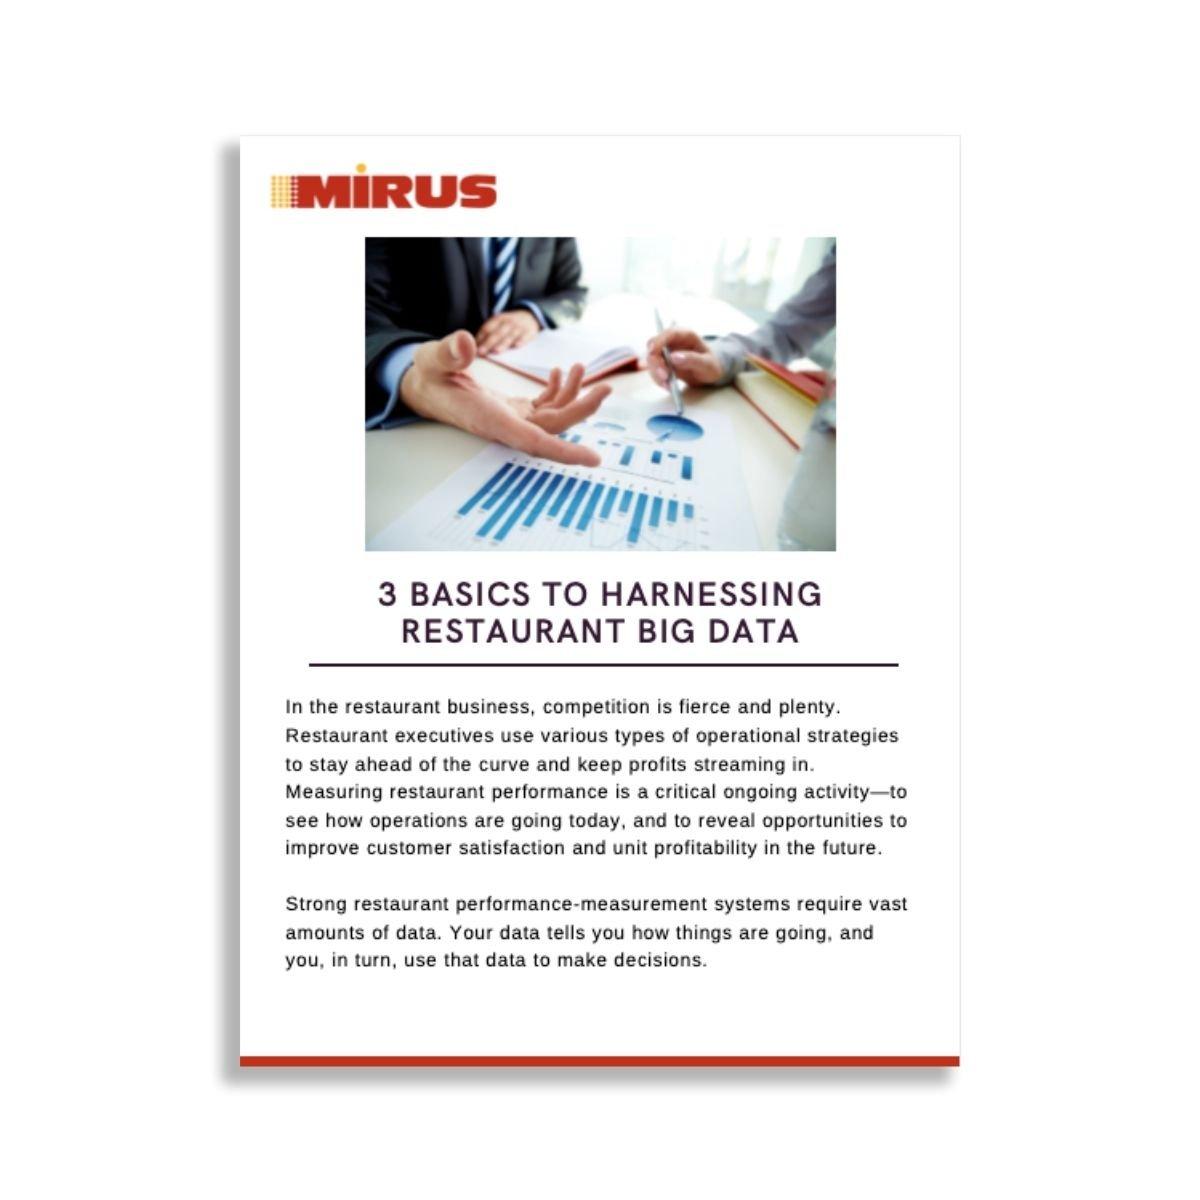 3 Basics to Harnessing Restaurant Big Data Graphic